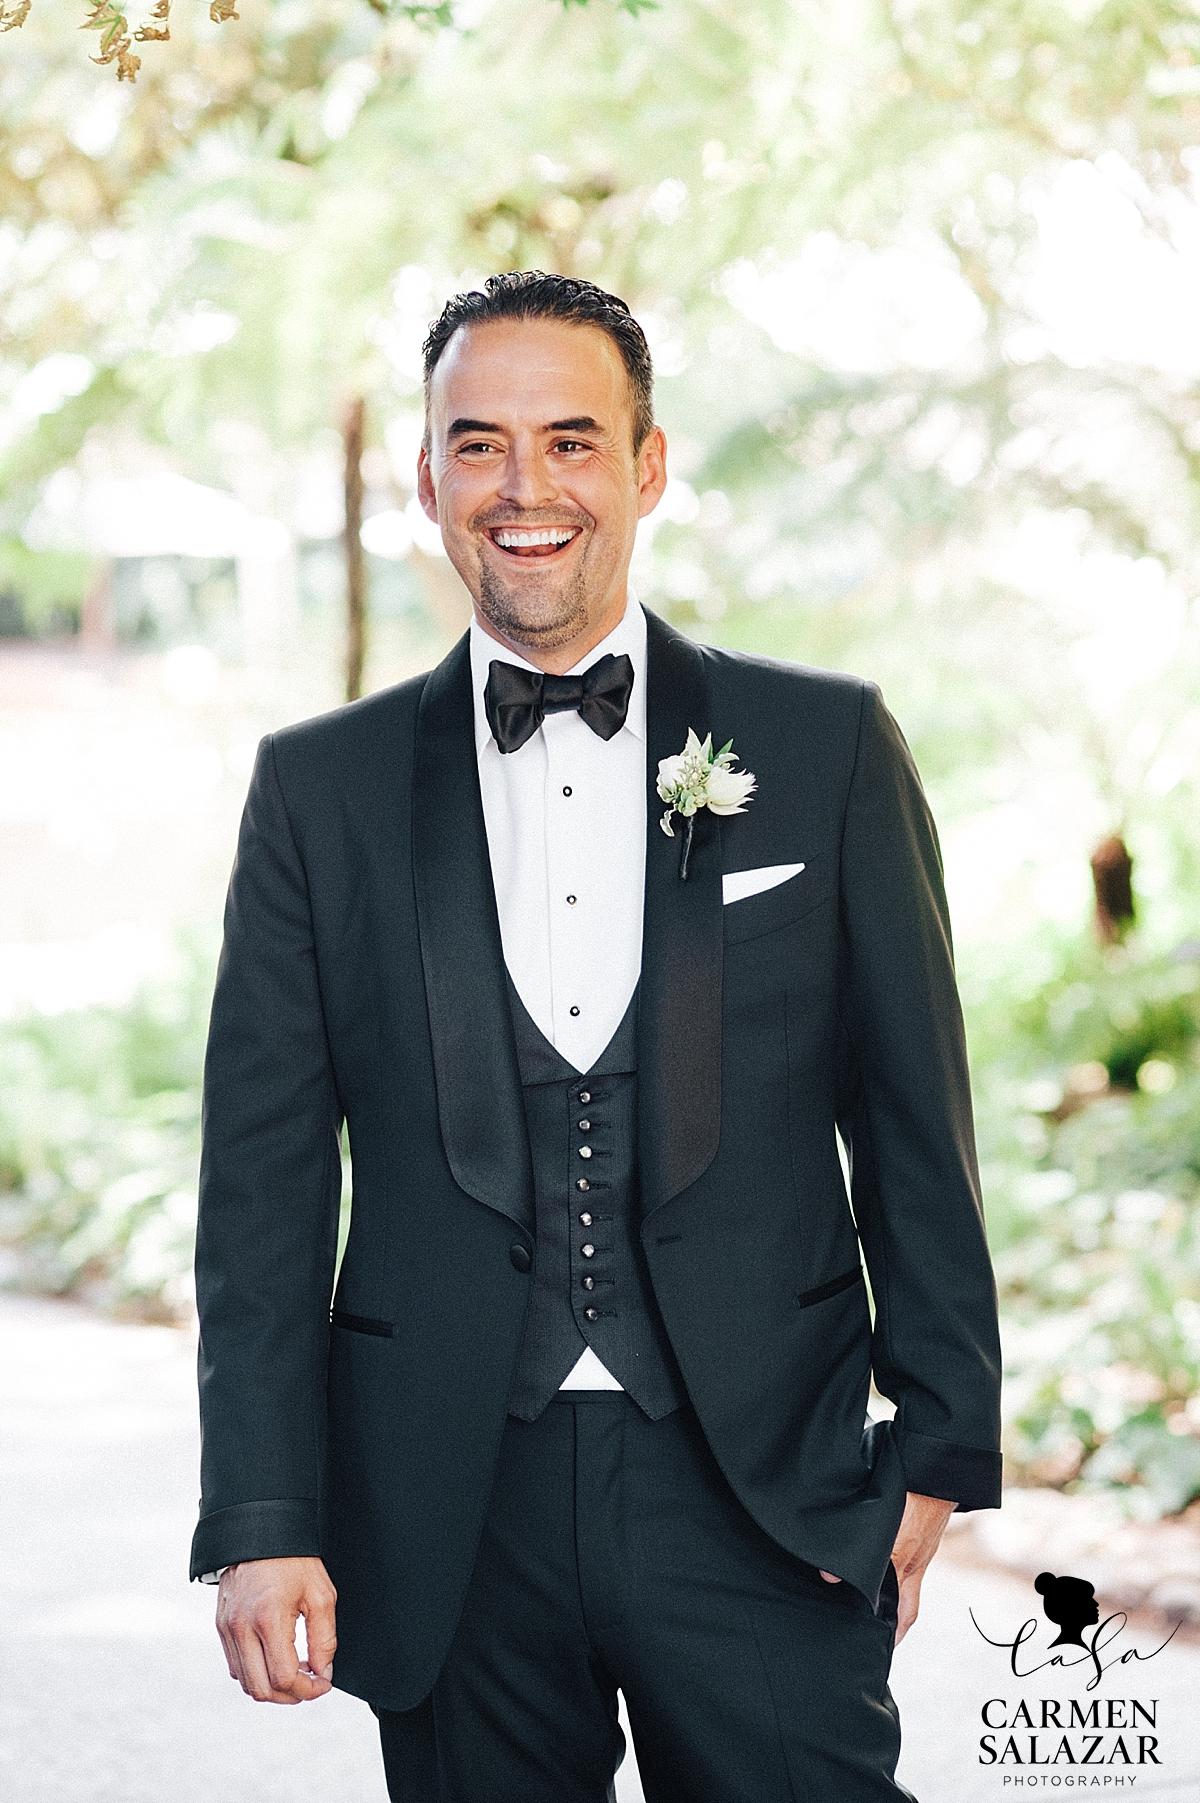 Wine & Roses groom wedding portraits - Carmen Salazar